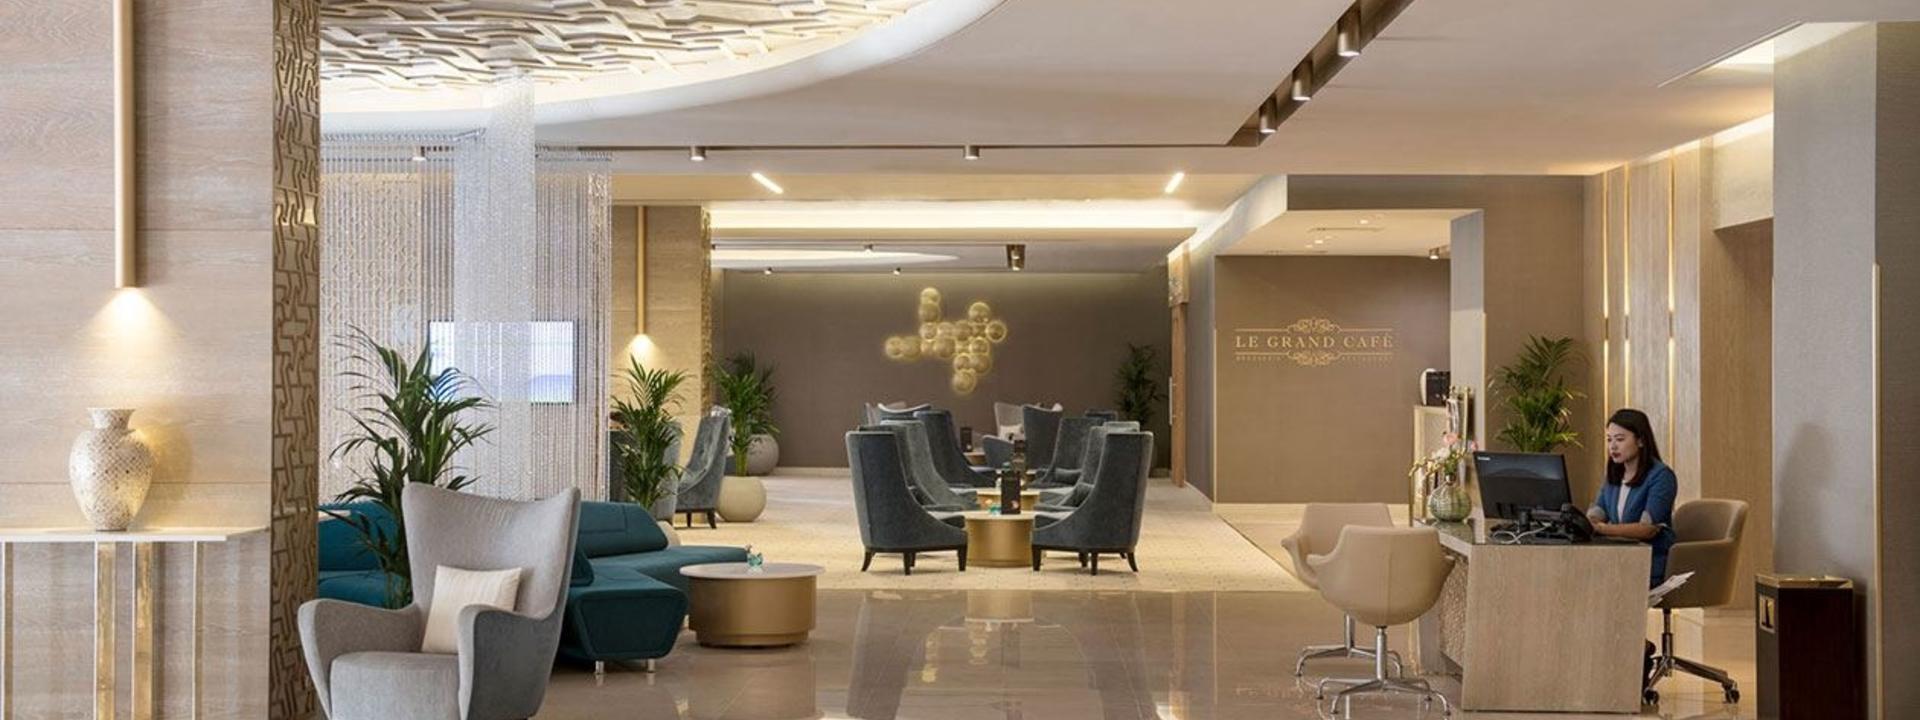 Lobby at Two Seasons Hotel & Apartments in Dubai